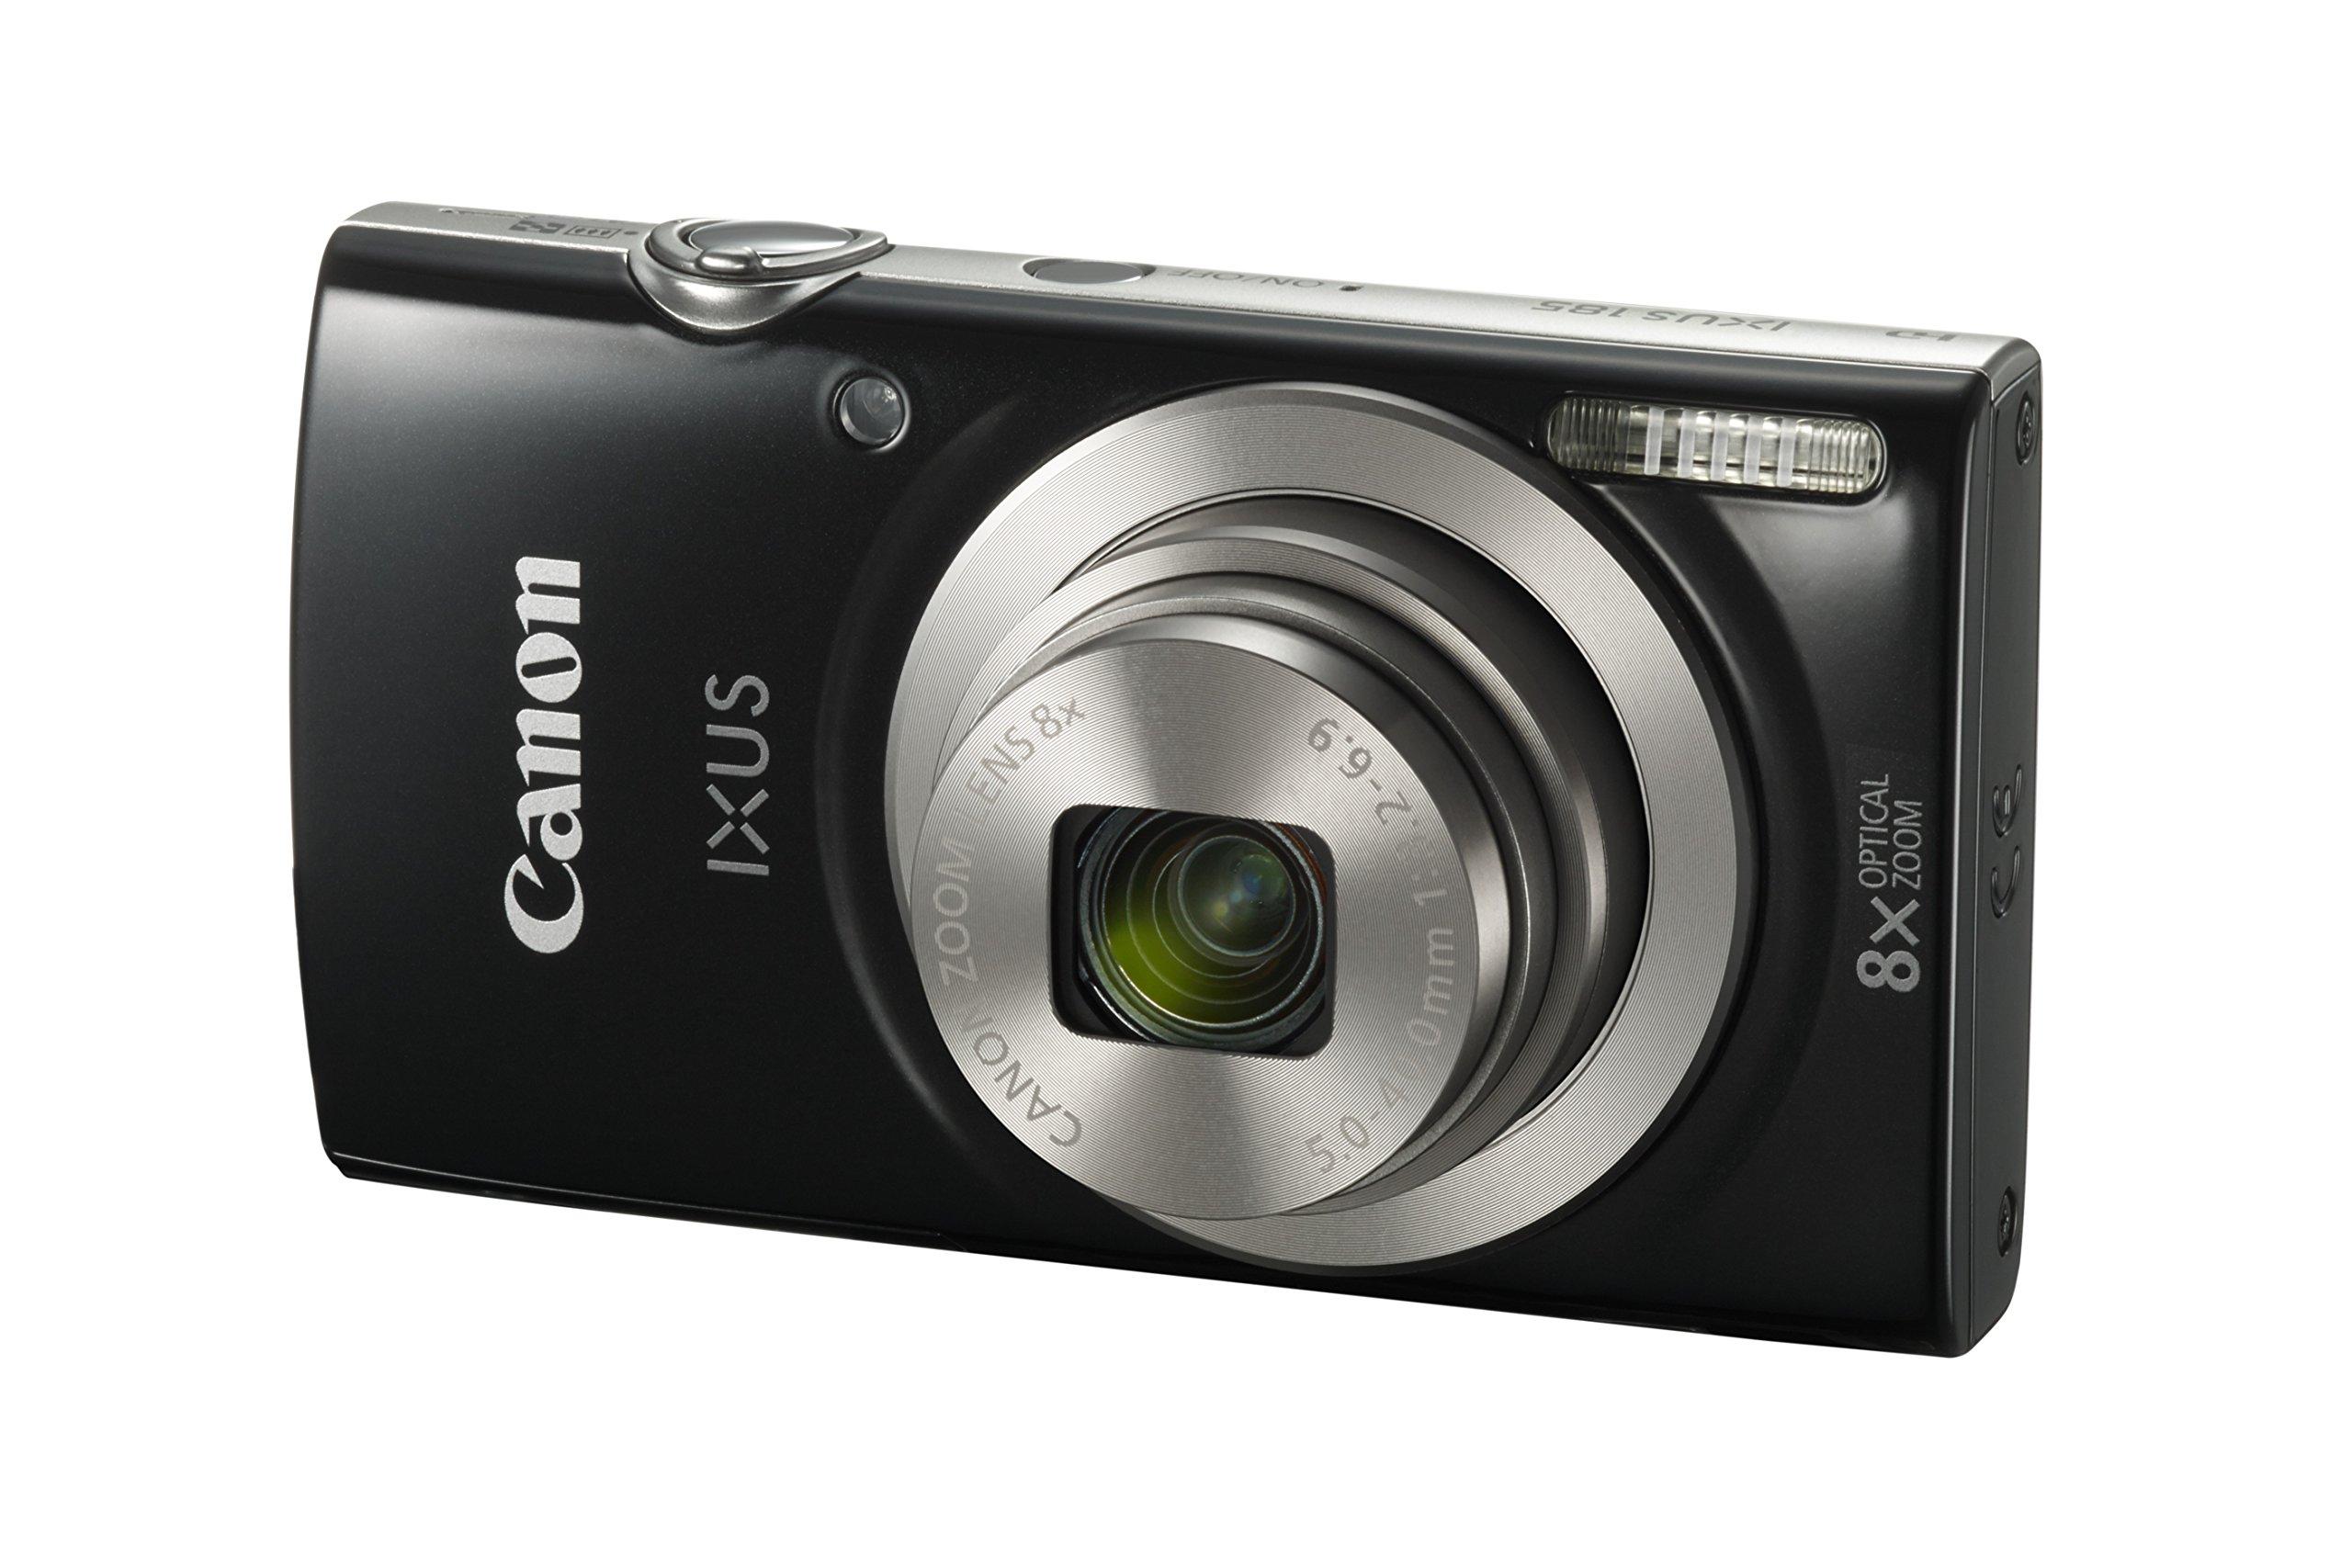 Canon Ixus 185 Digital Camera Black Buy Online In Samoa At Desertcart